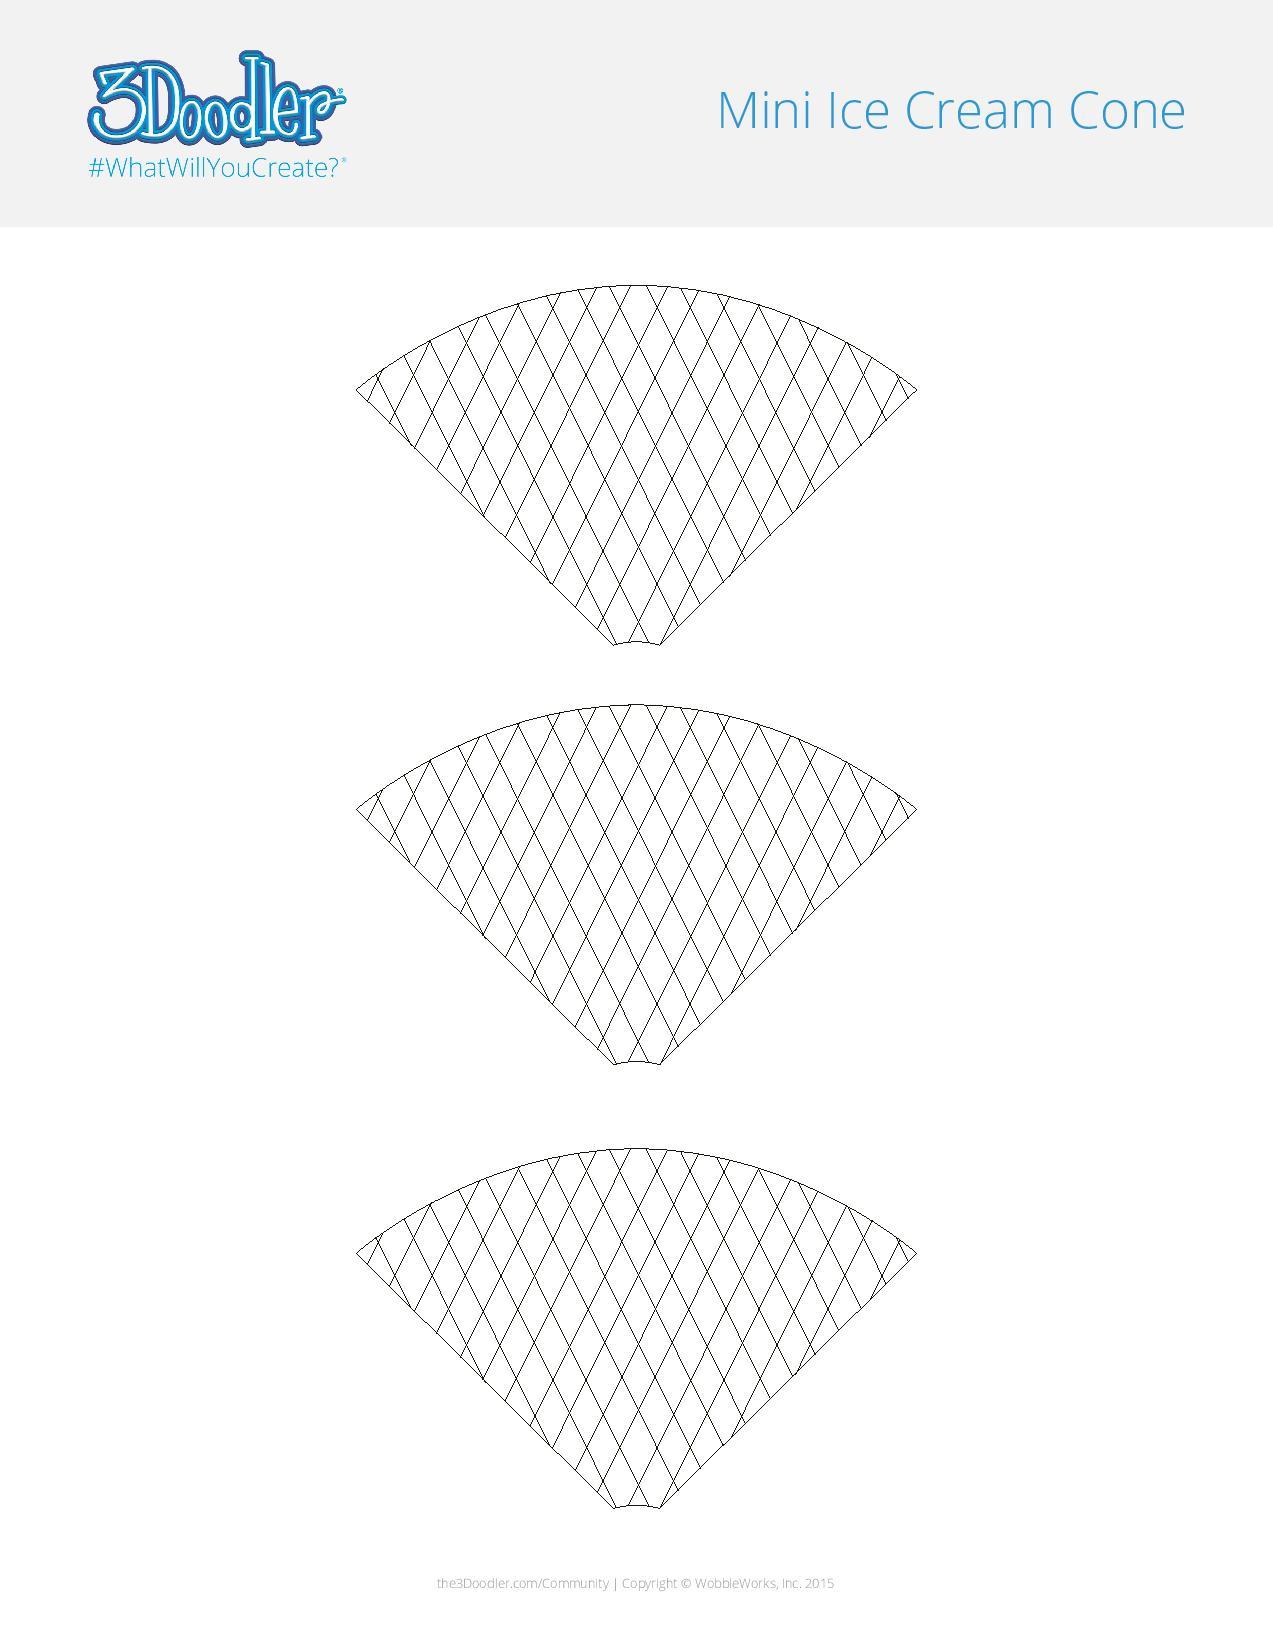 3D Pen Stencil Template DIY Ice Cream Cones